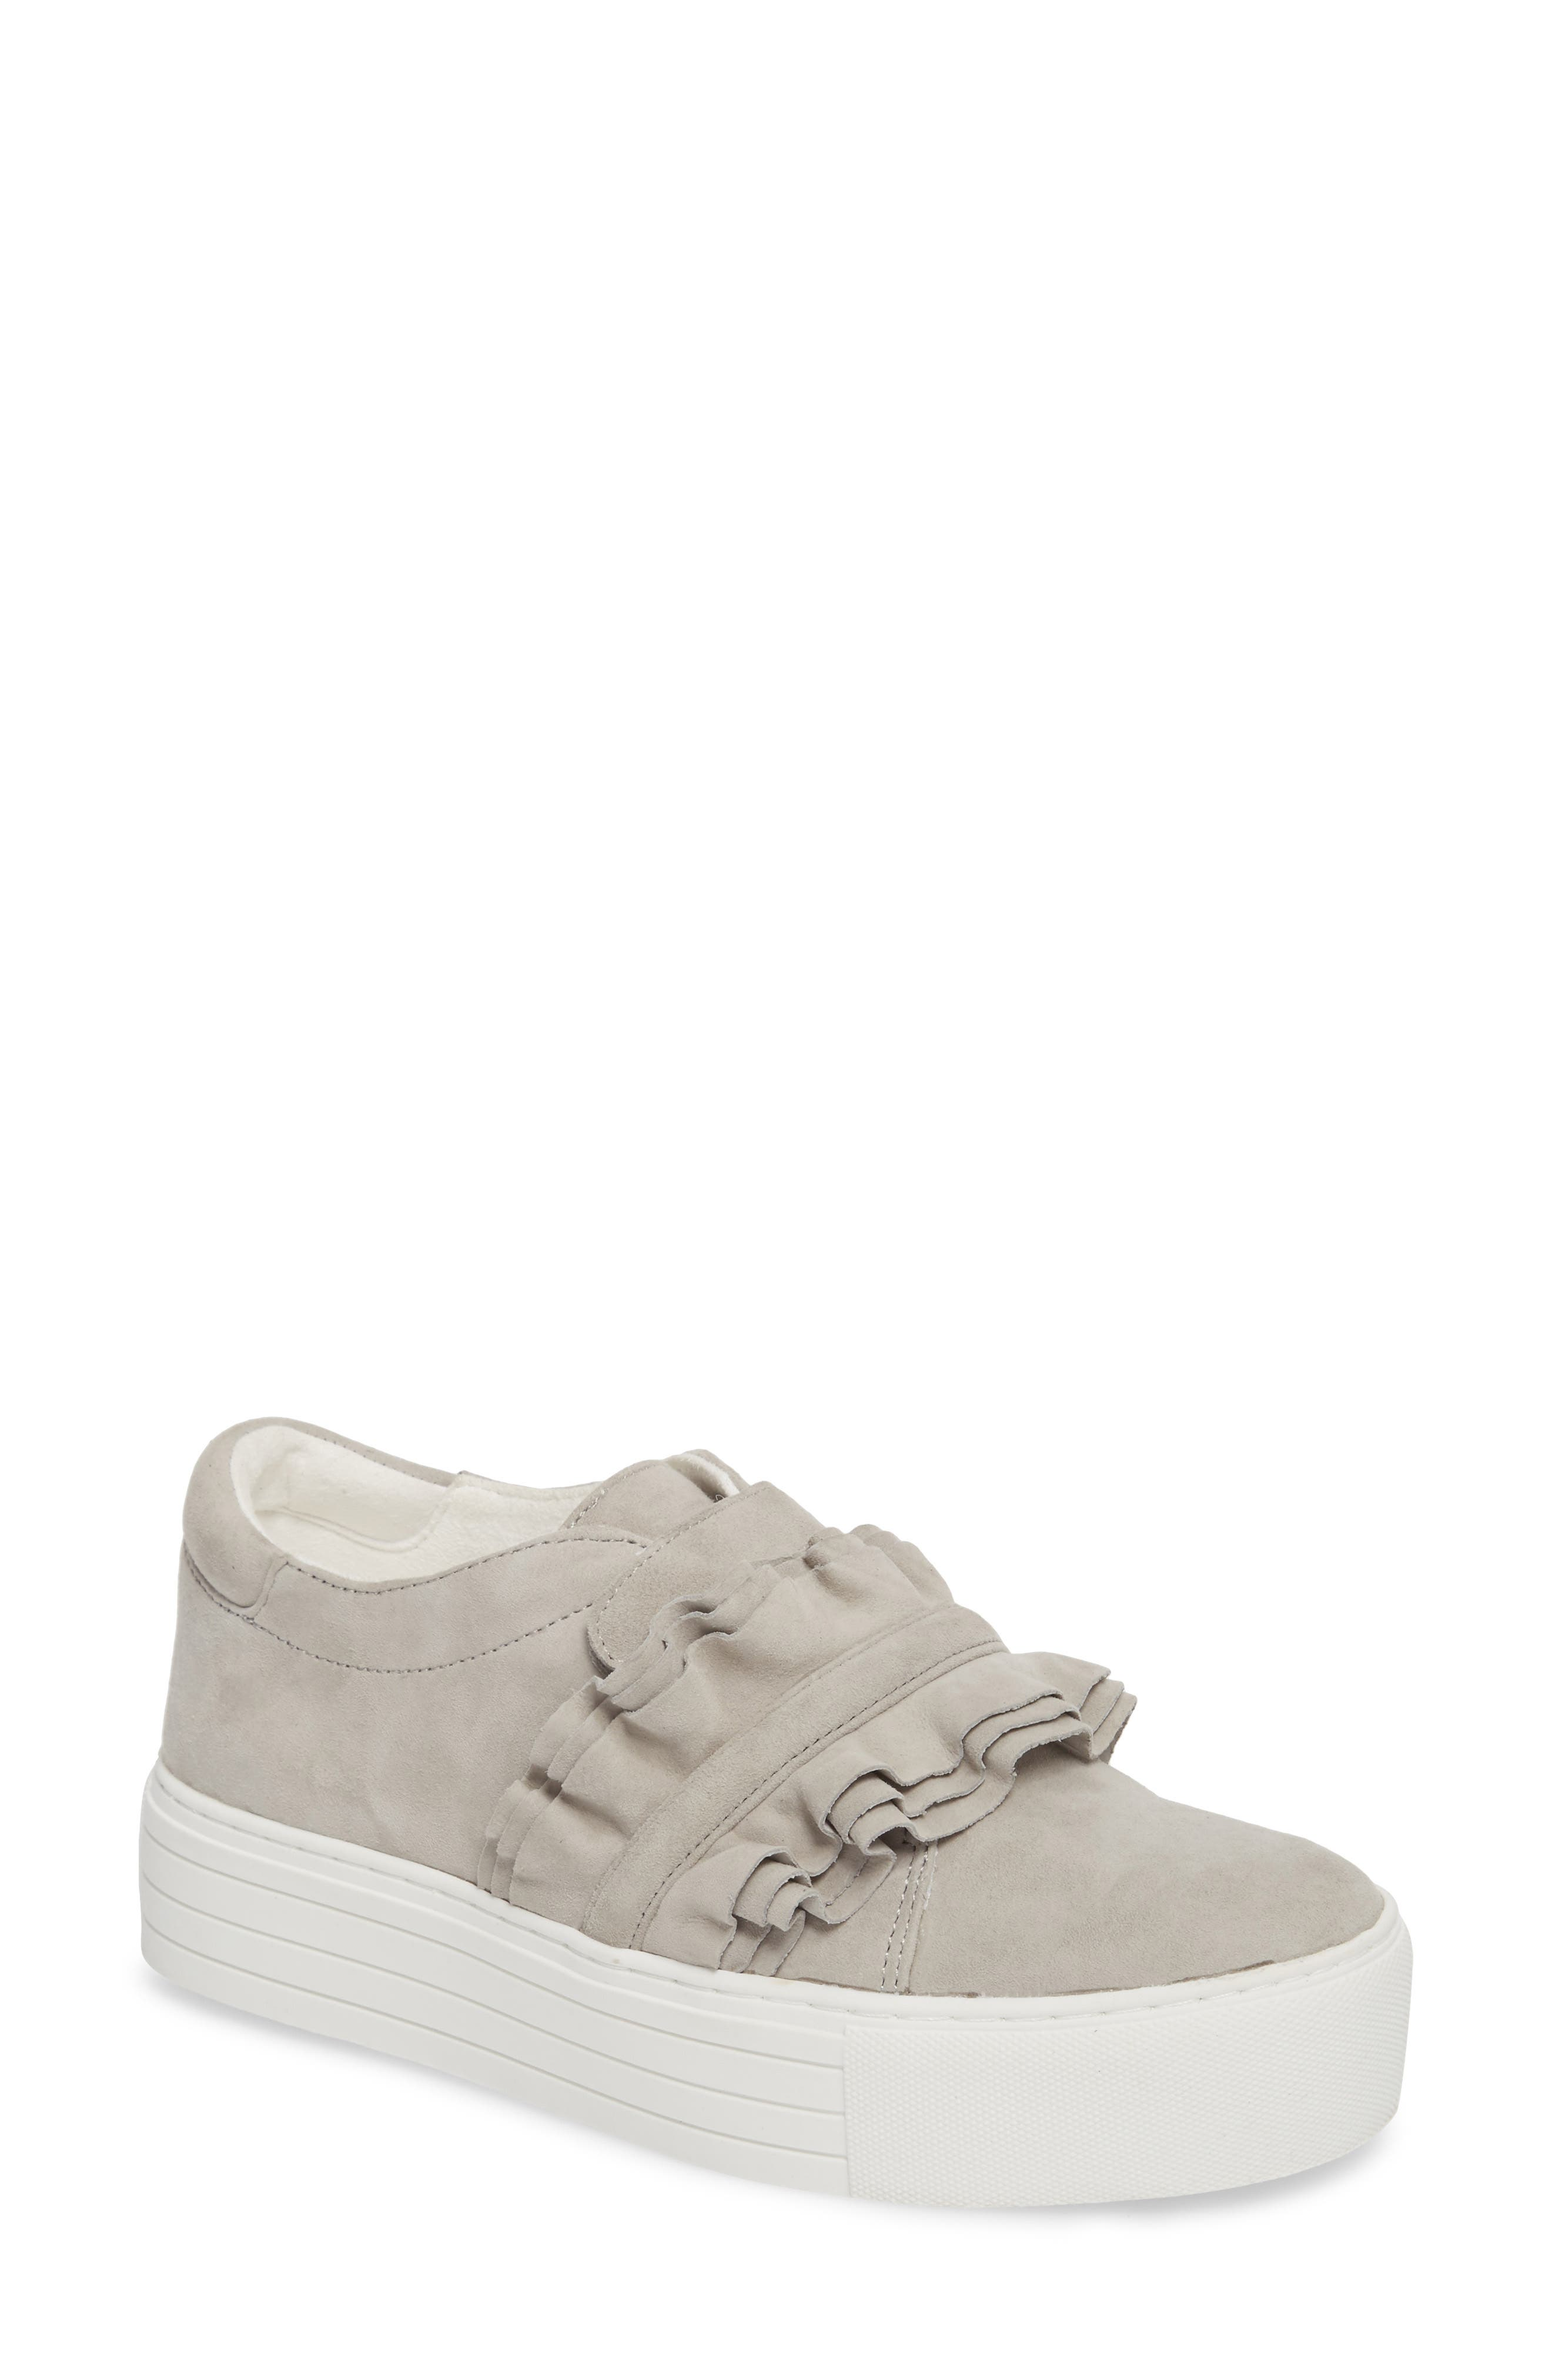 Ashlee Slip-On Sneaker,                             Main thumbnail 1, color,                             021